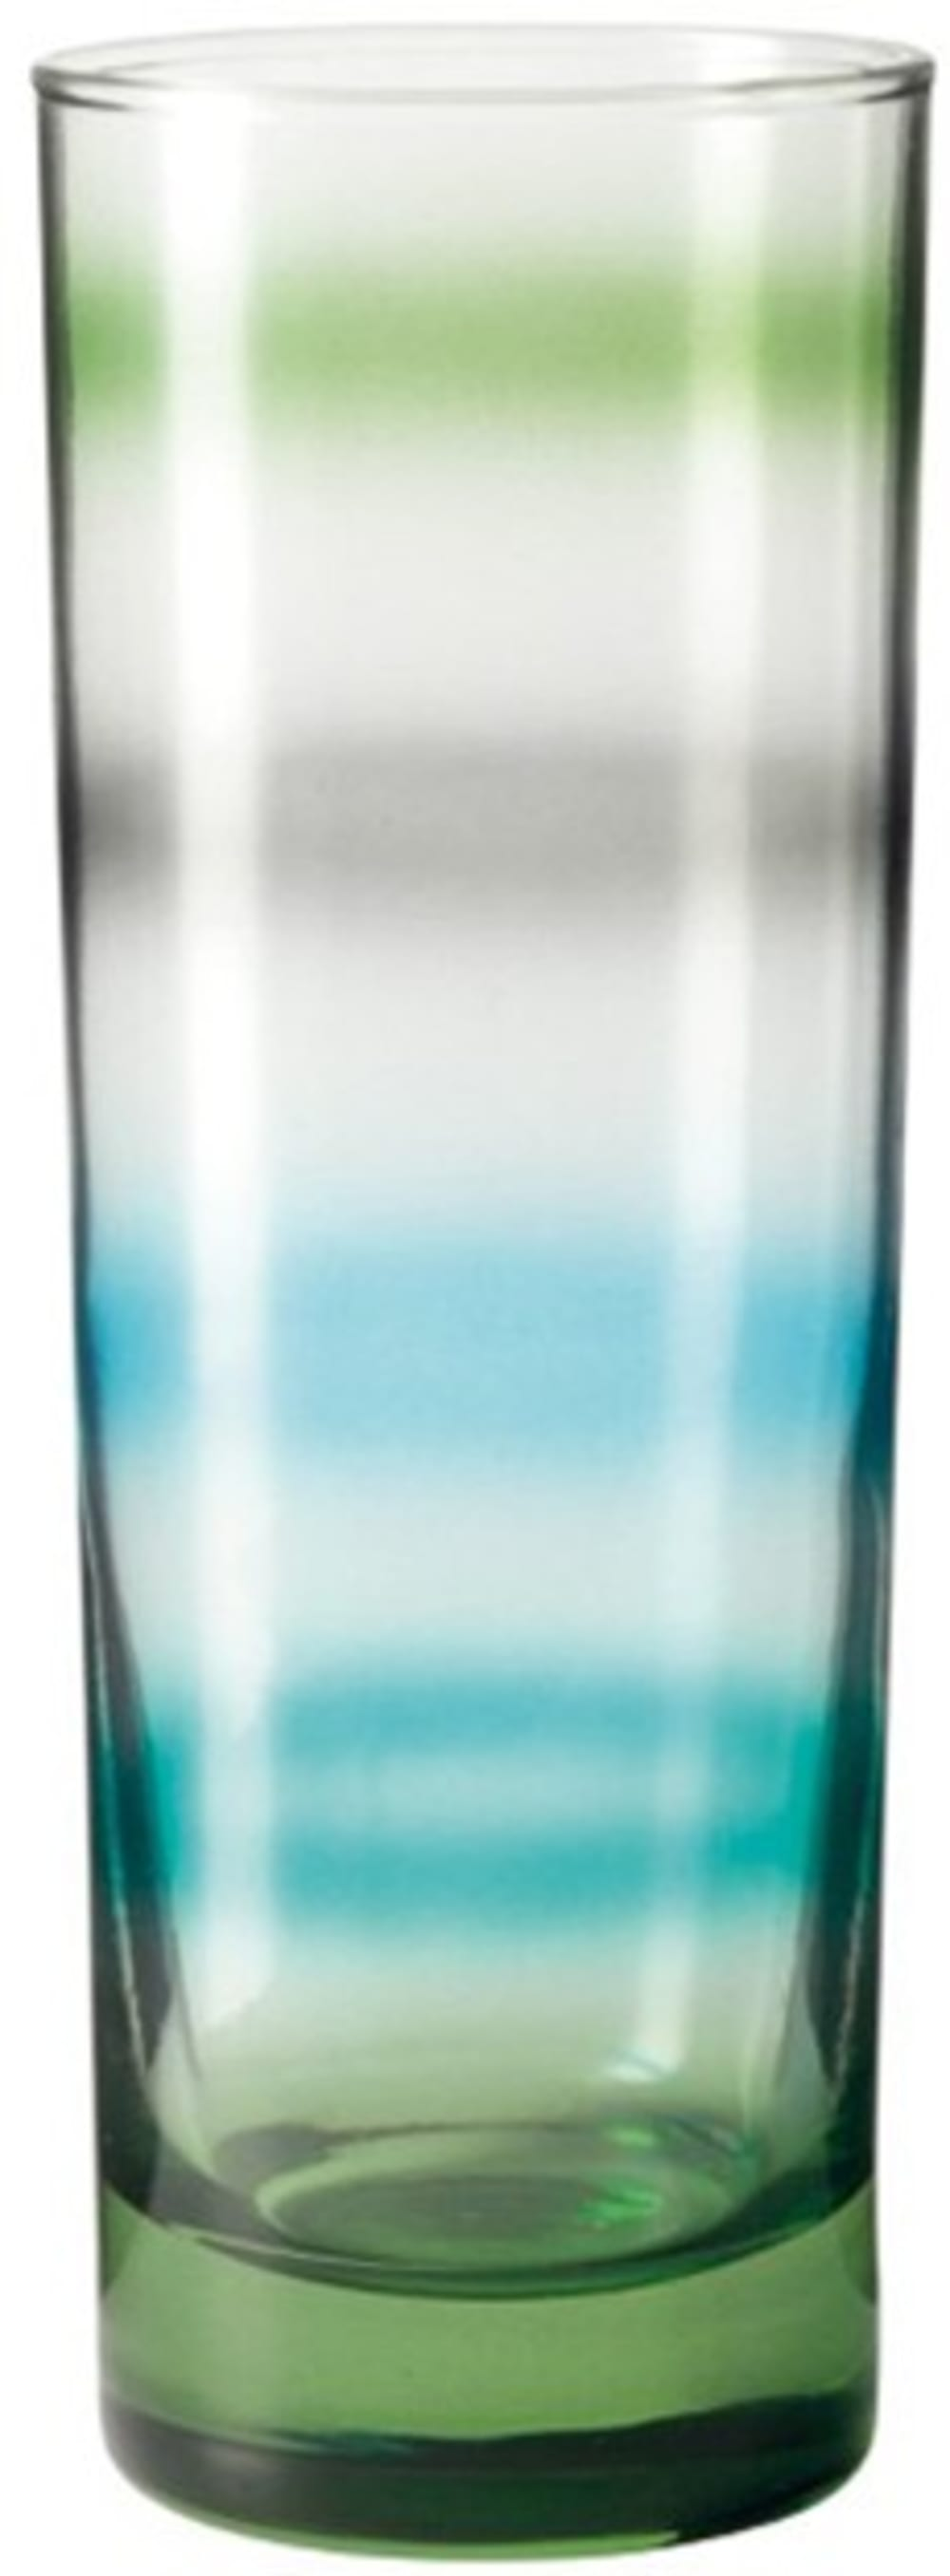 LO - Szklanka 305 ml, zielona, RAINBOW